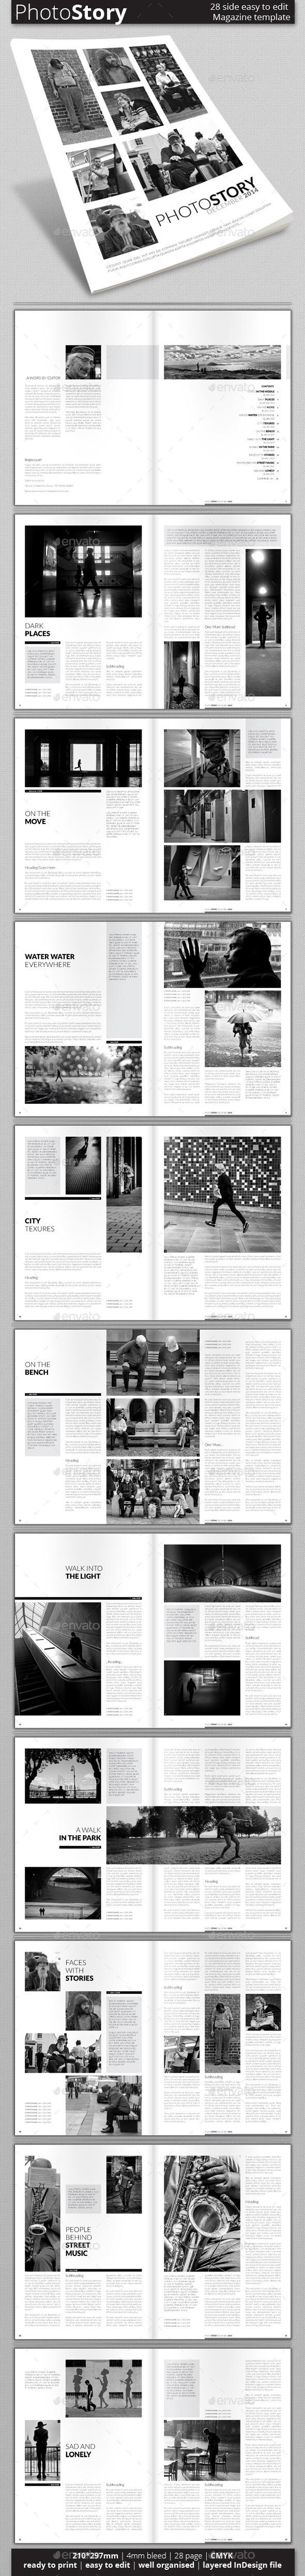 Multipurpose Magazine Template (Vol. 3) - Magazines Print Templates